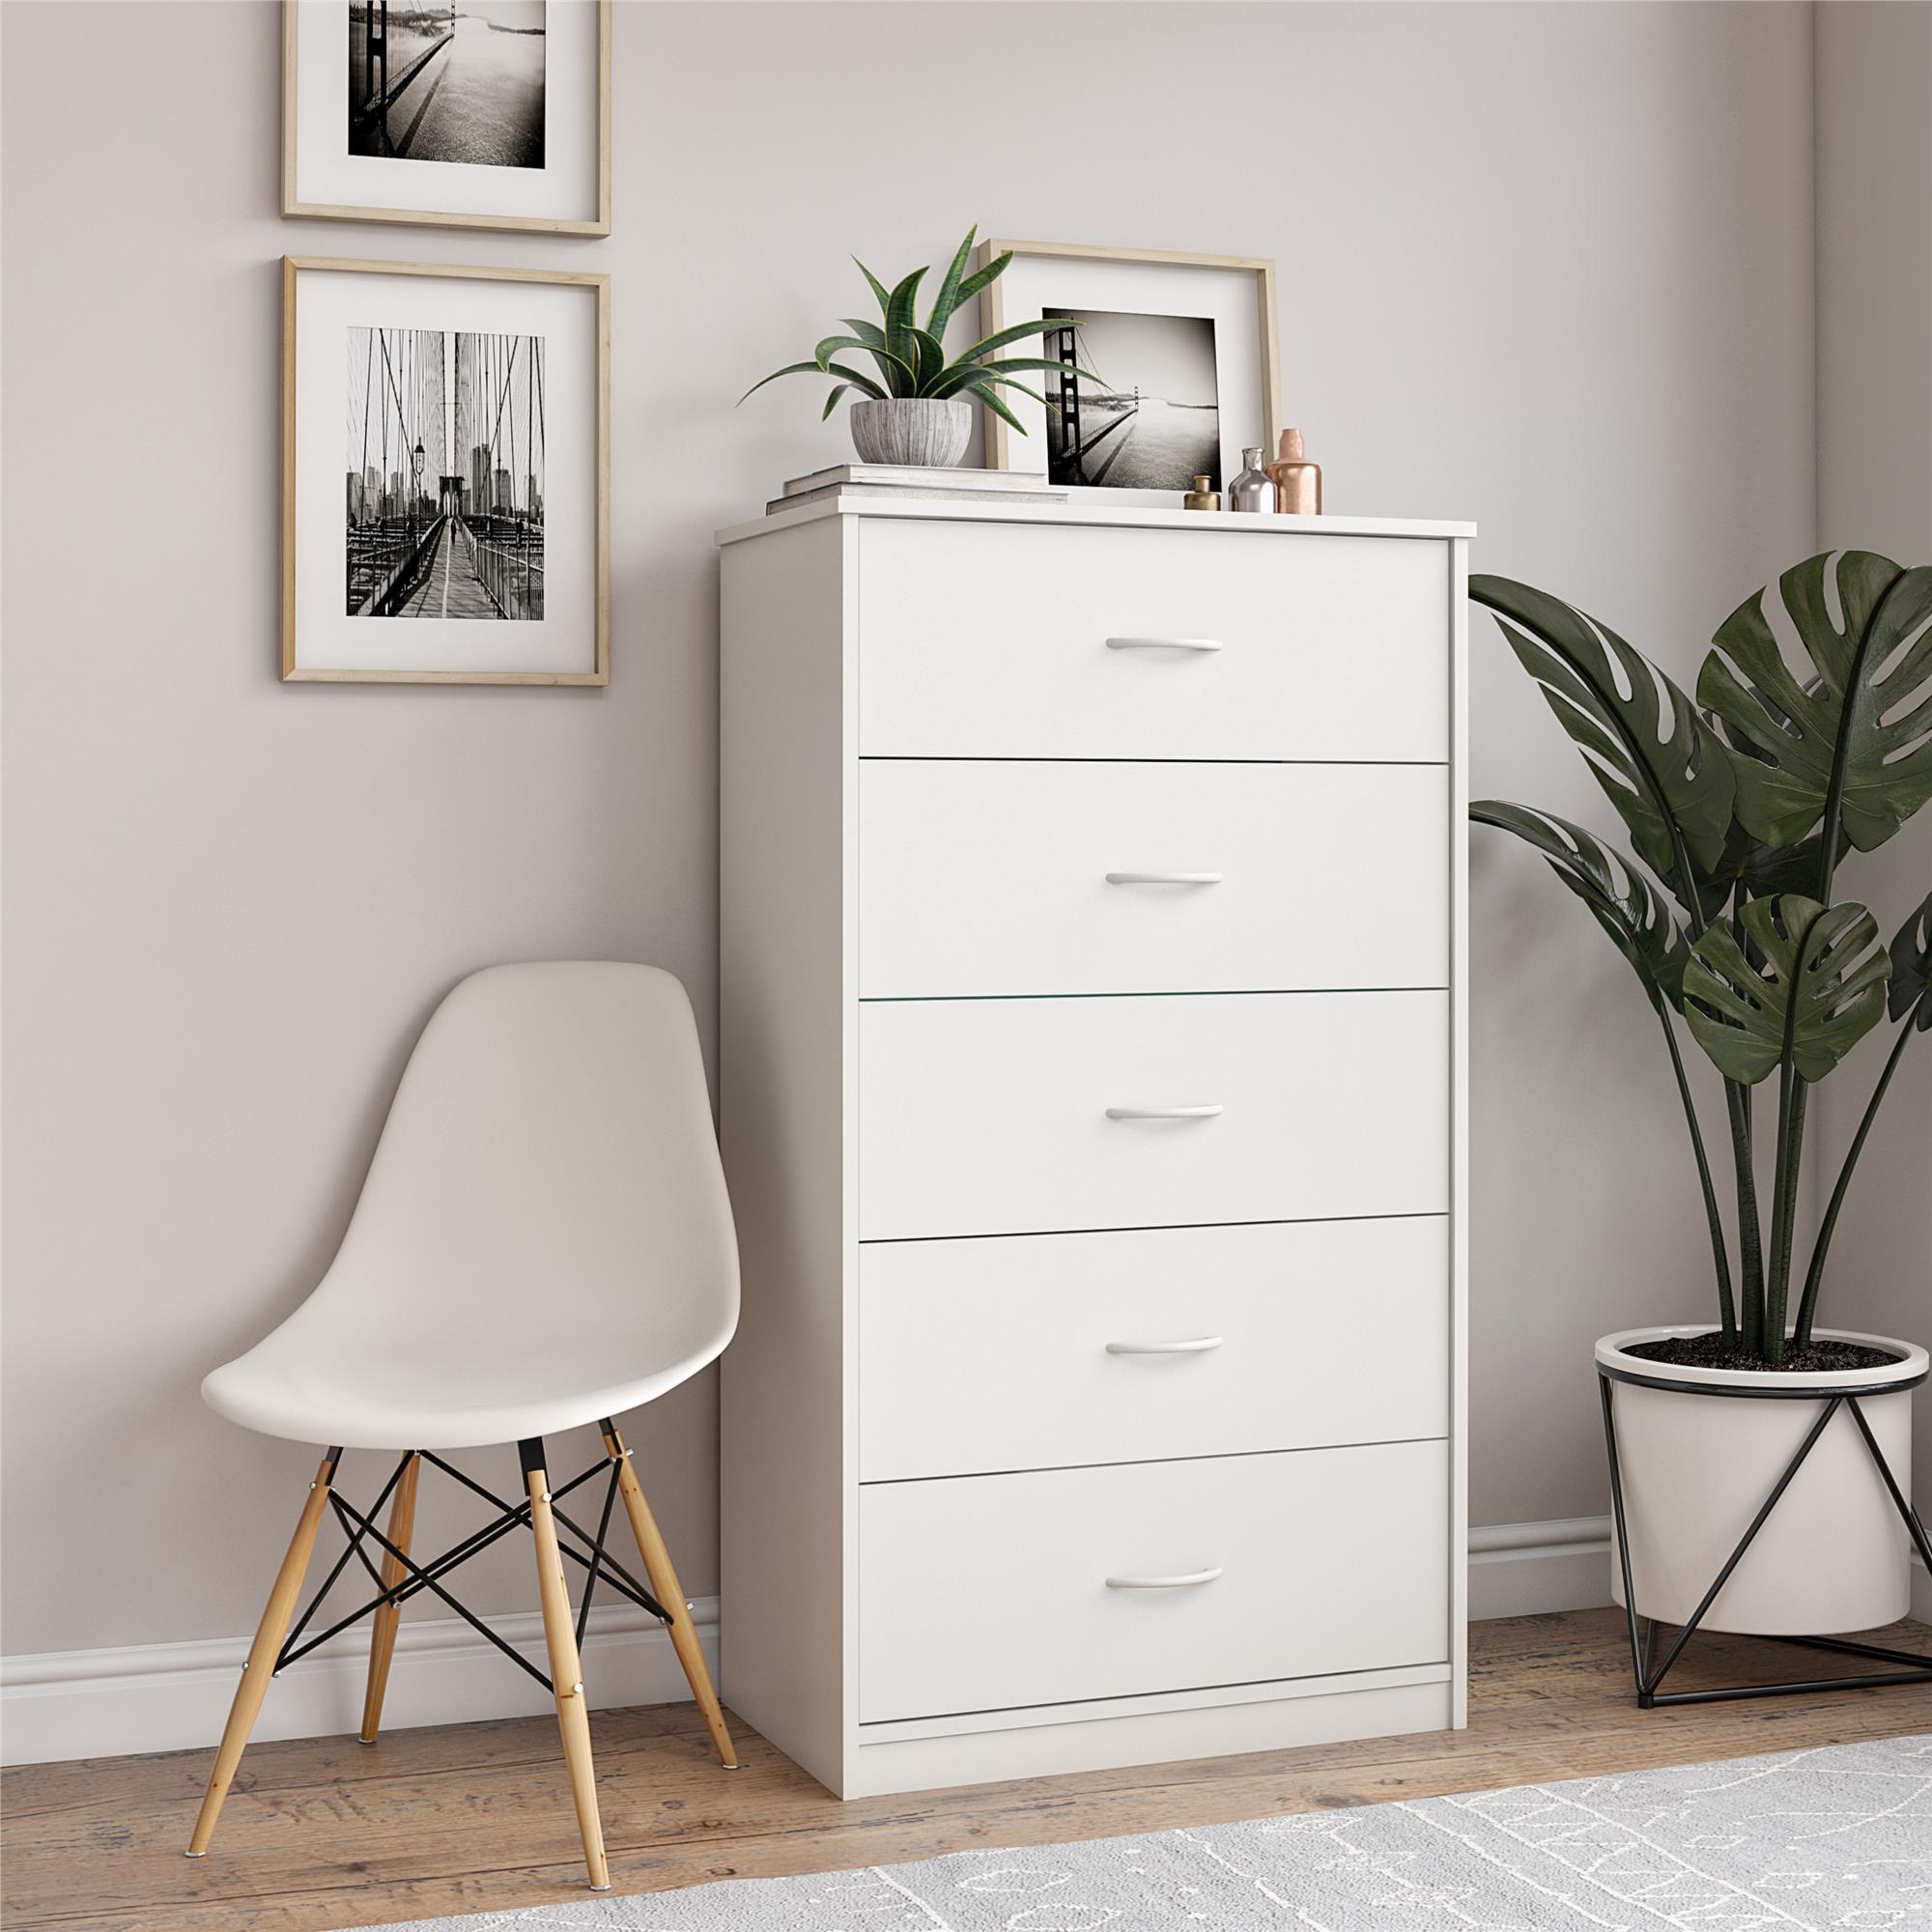 Mainstays Clic 5 Drawer Dresser